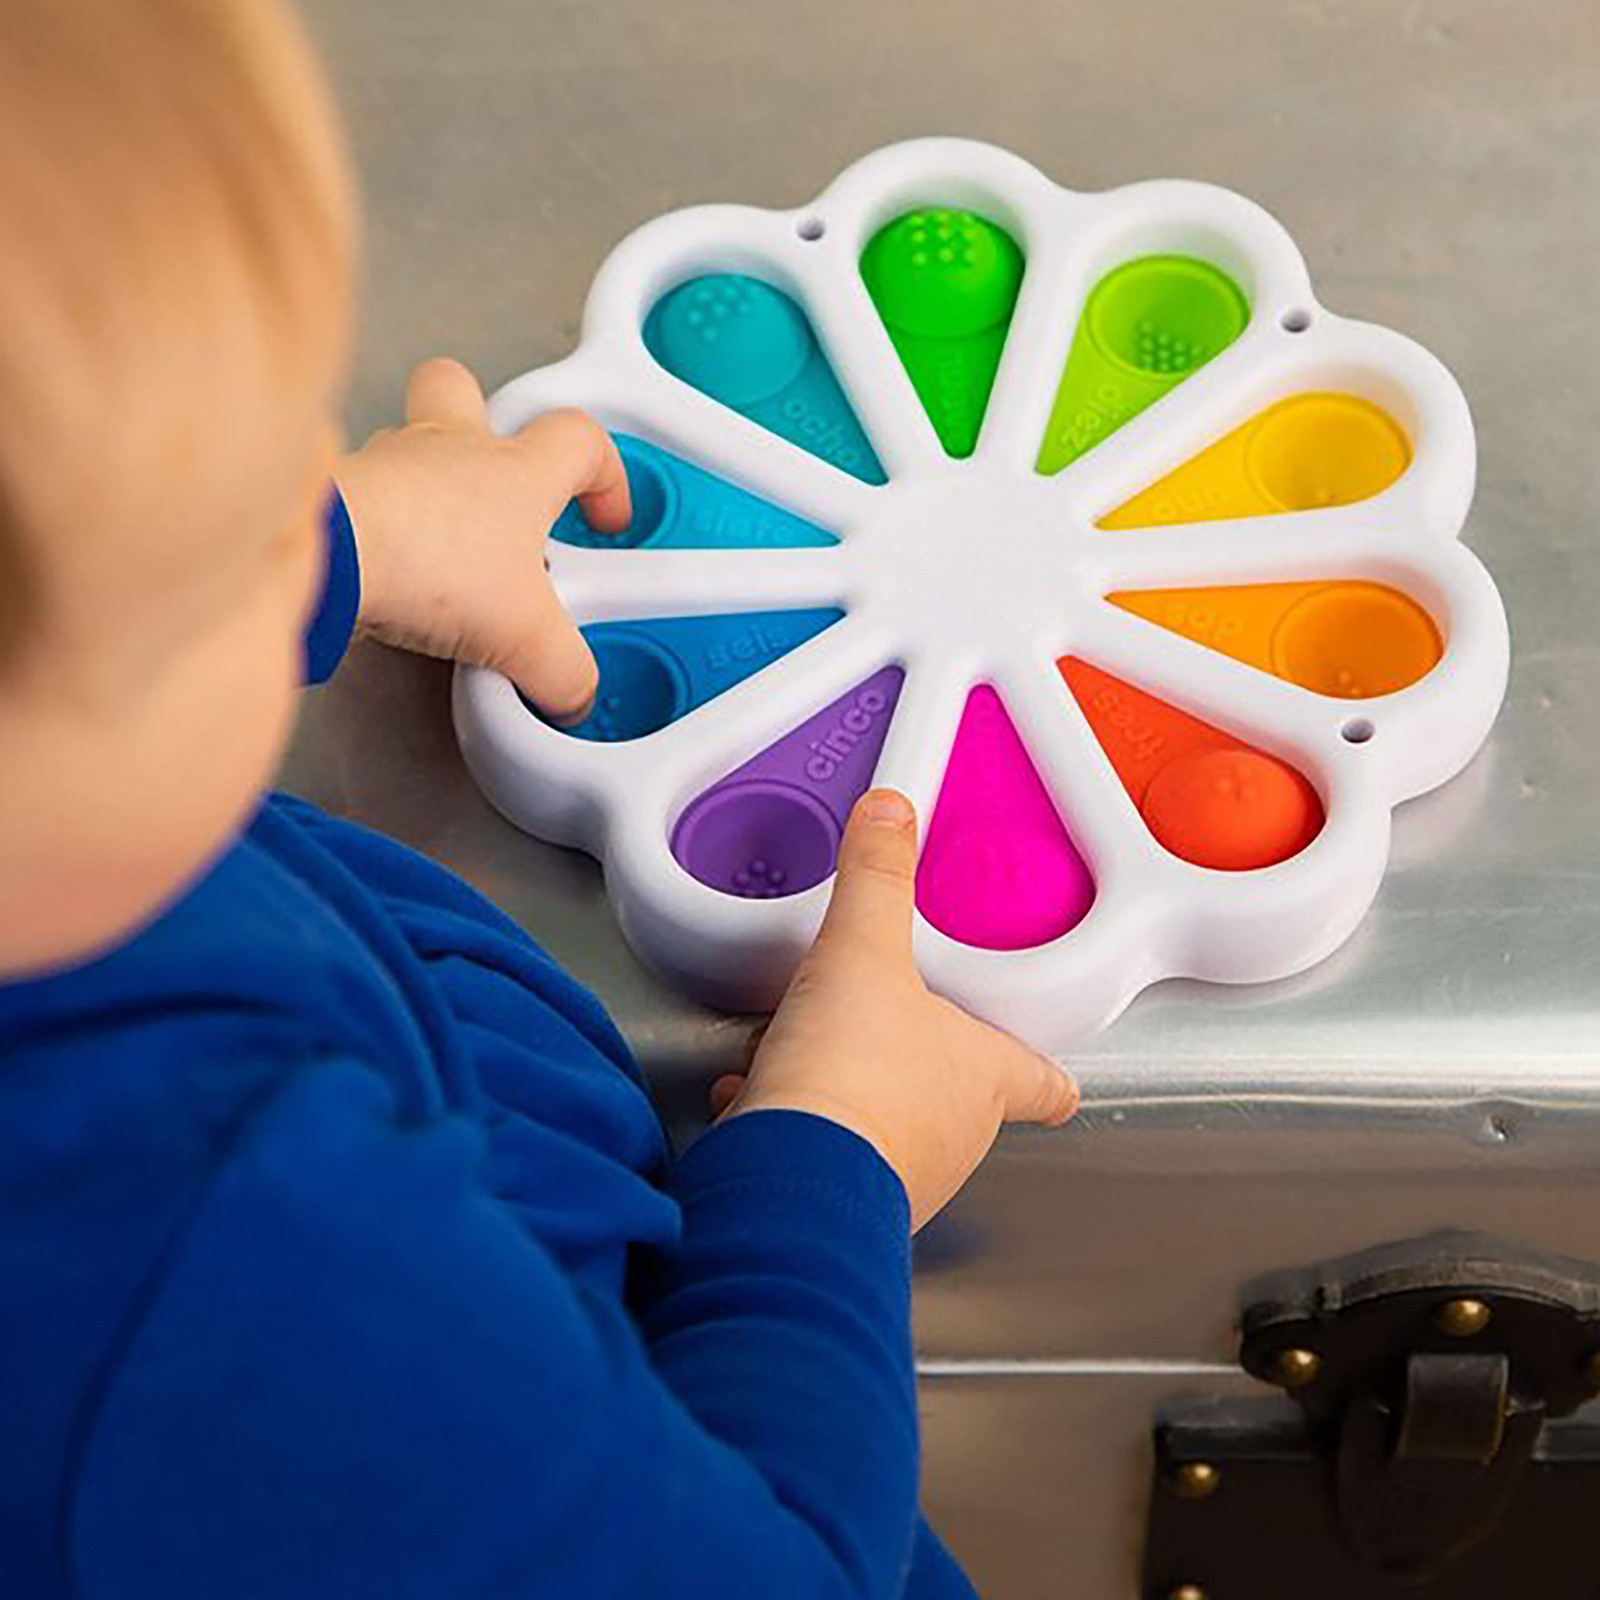 Toy Adult Bubble-Sensory-Toy Autism Pop Fidget Anti-Stress Squishy -Push Needs Funny img4